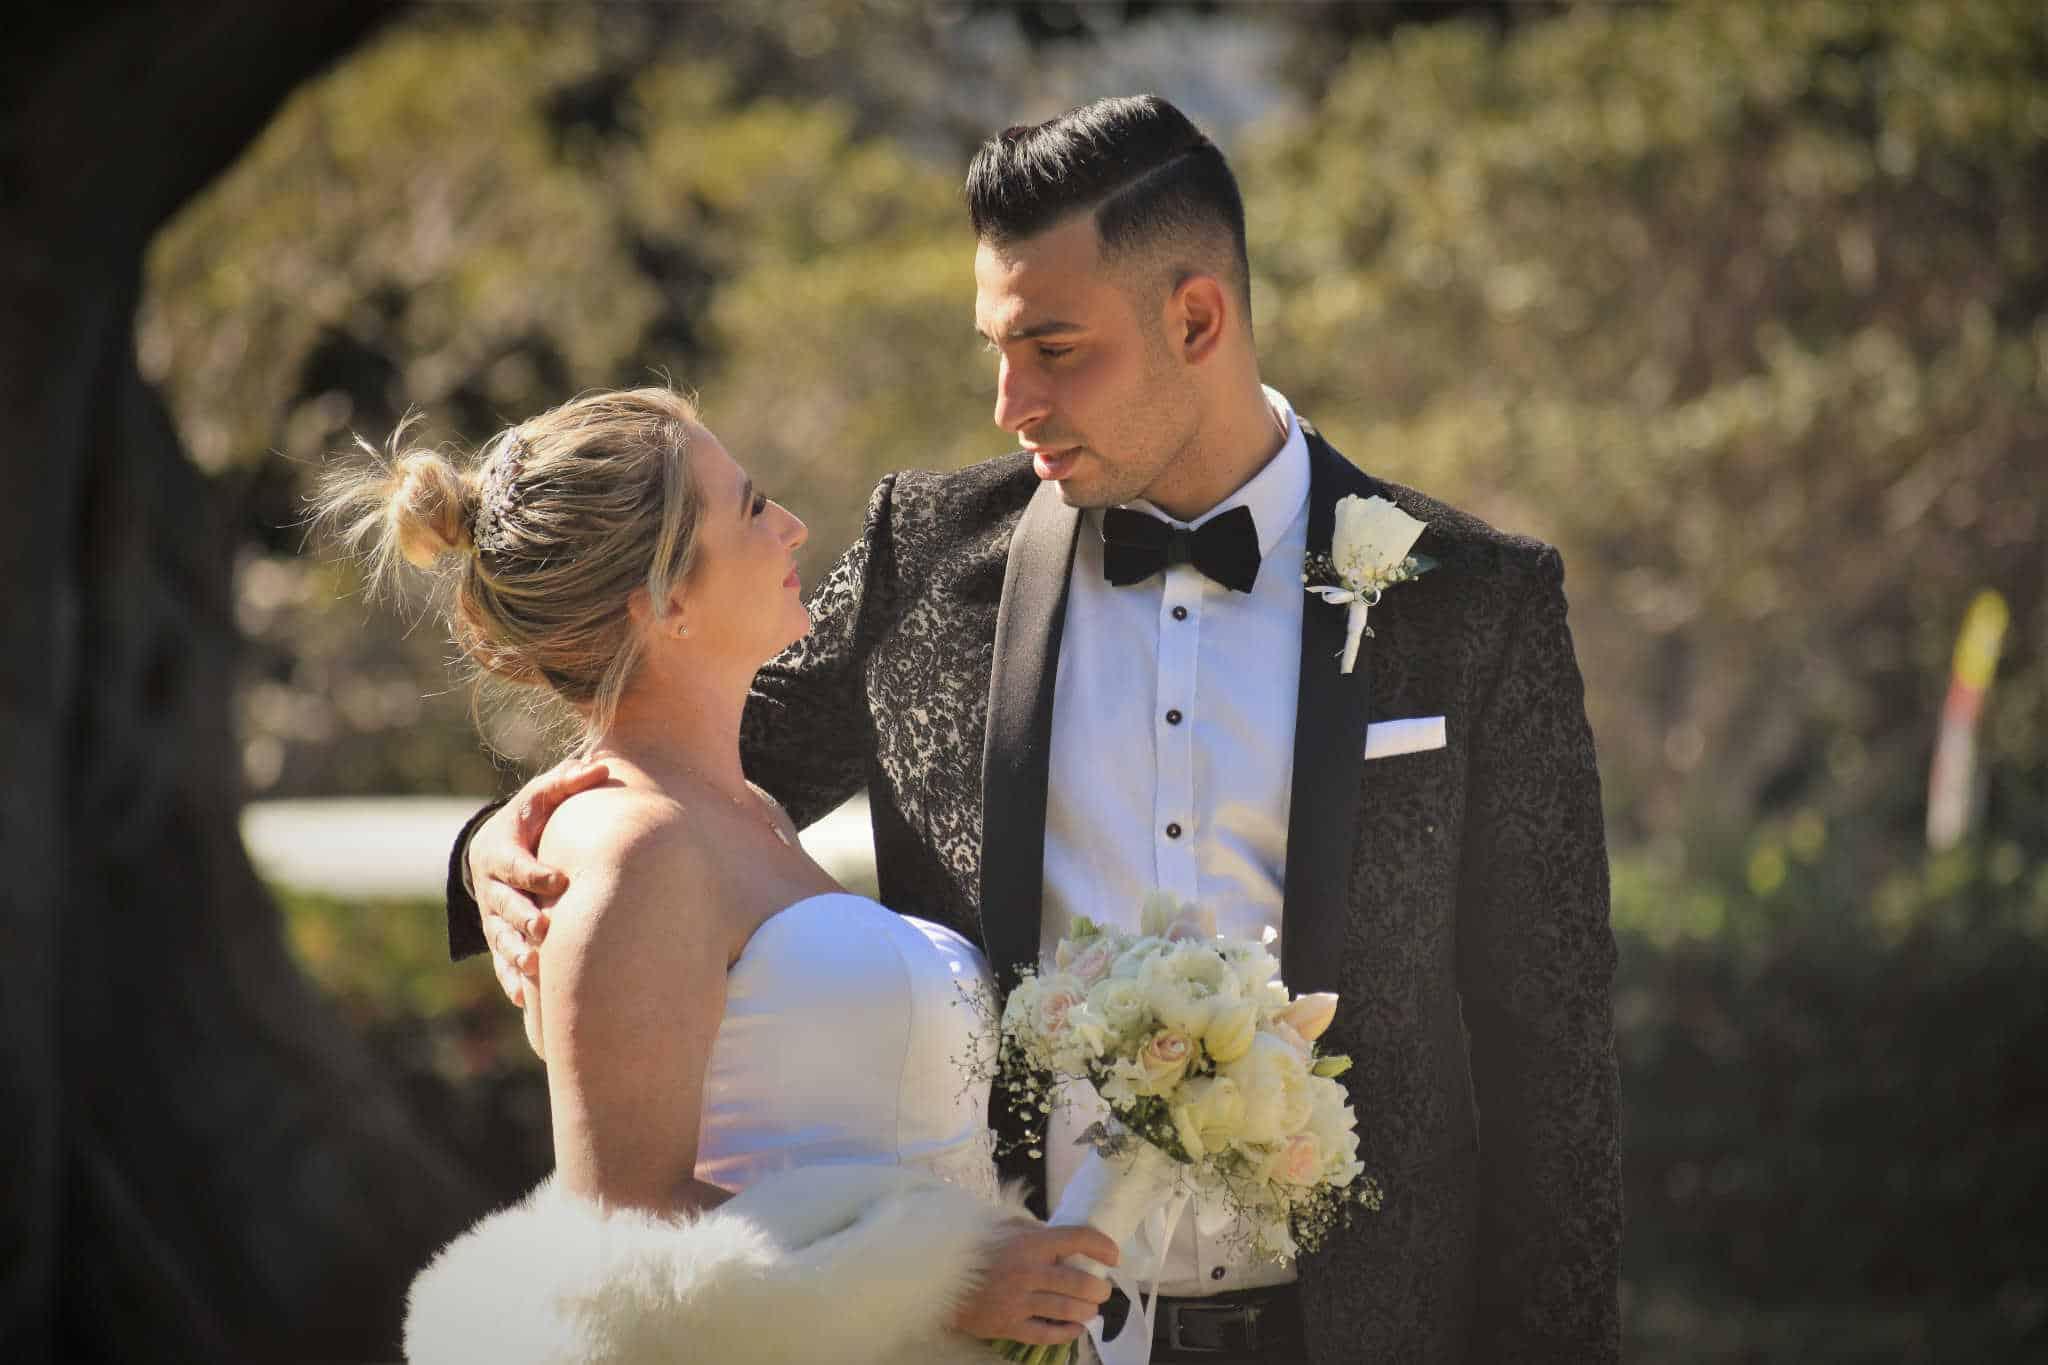 Hyde Park Wedding - Stephen Lee Sydney Marriage Celebrant